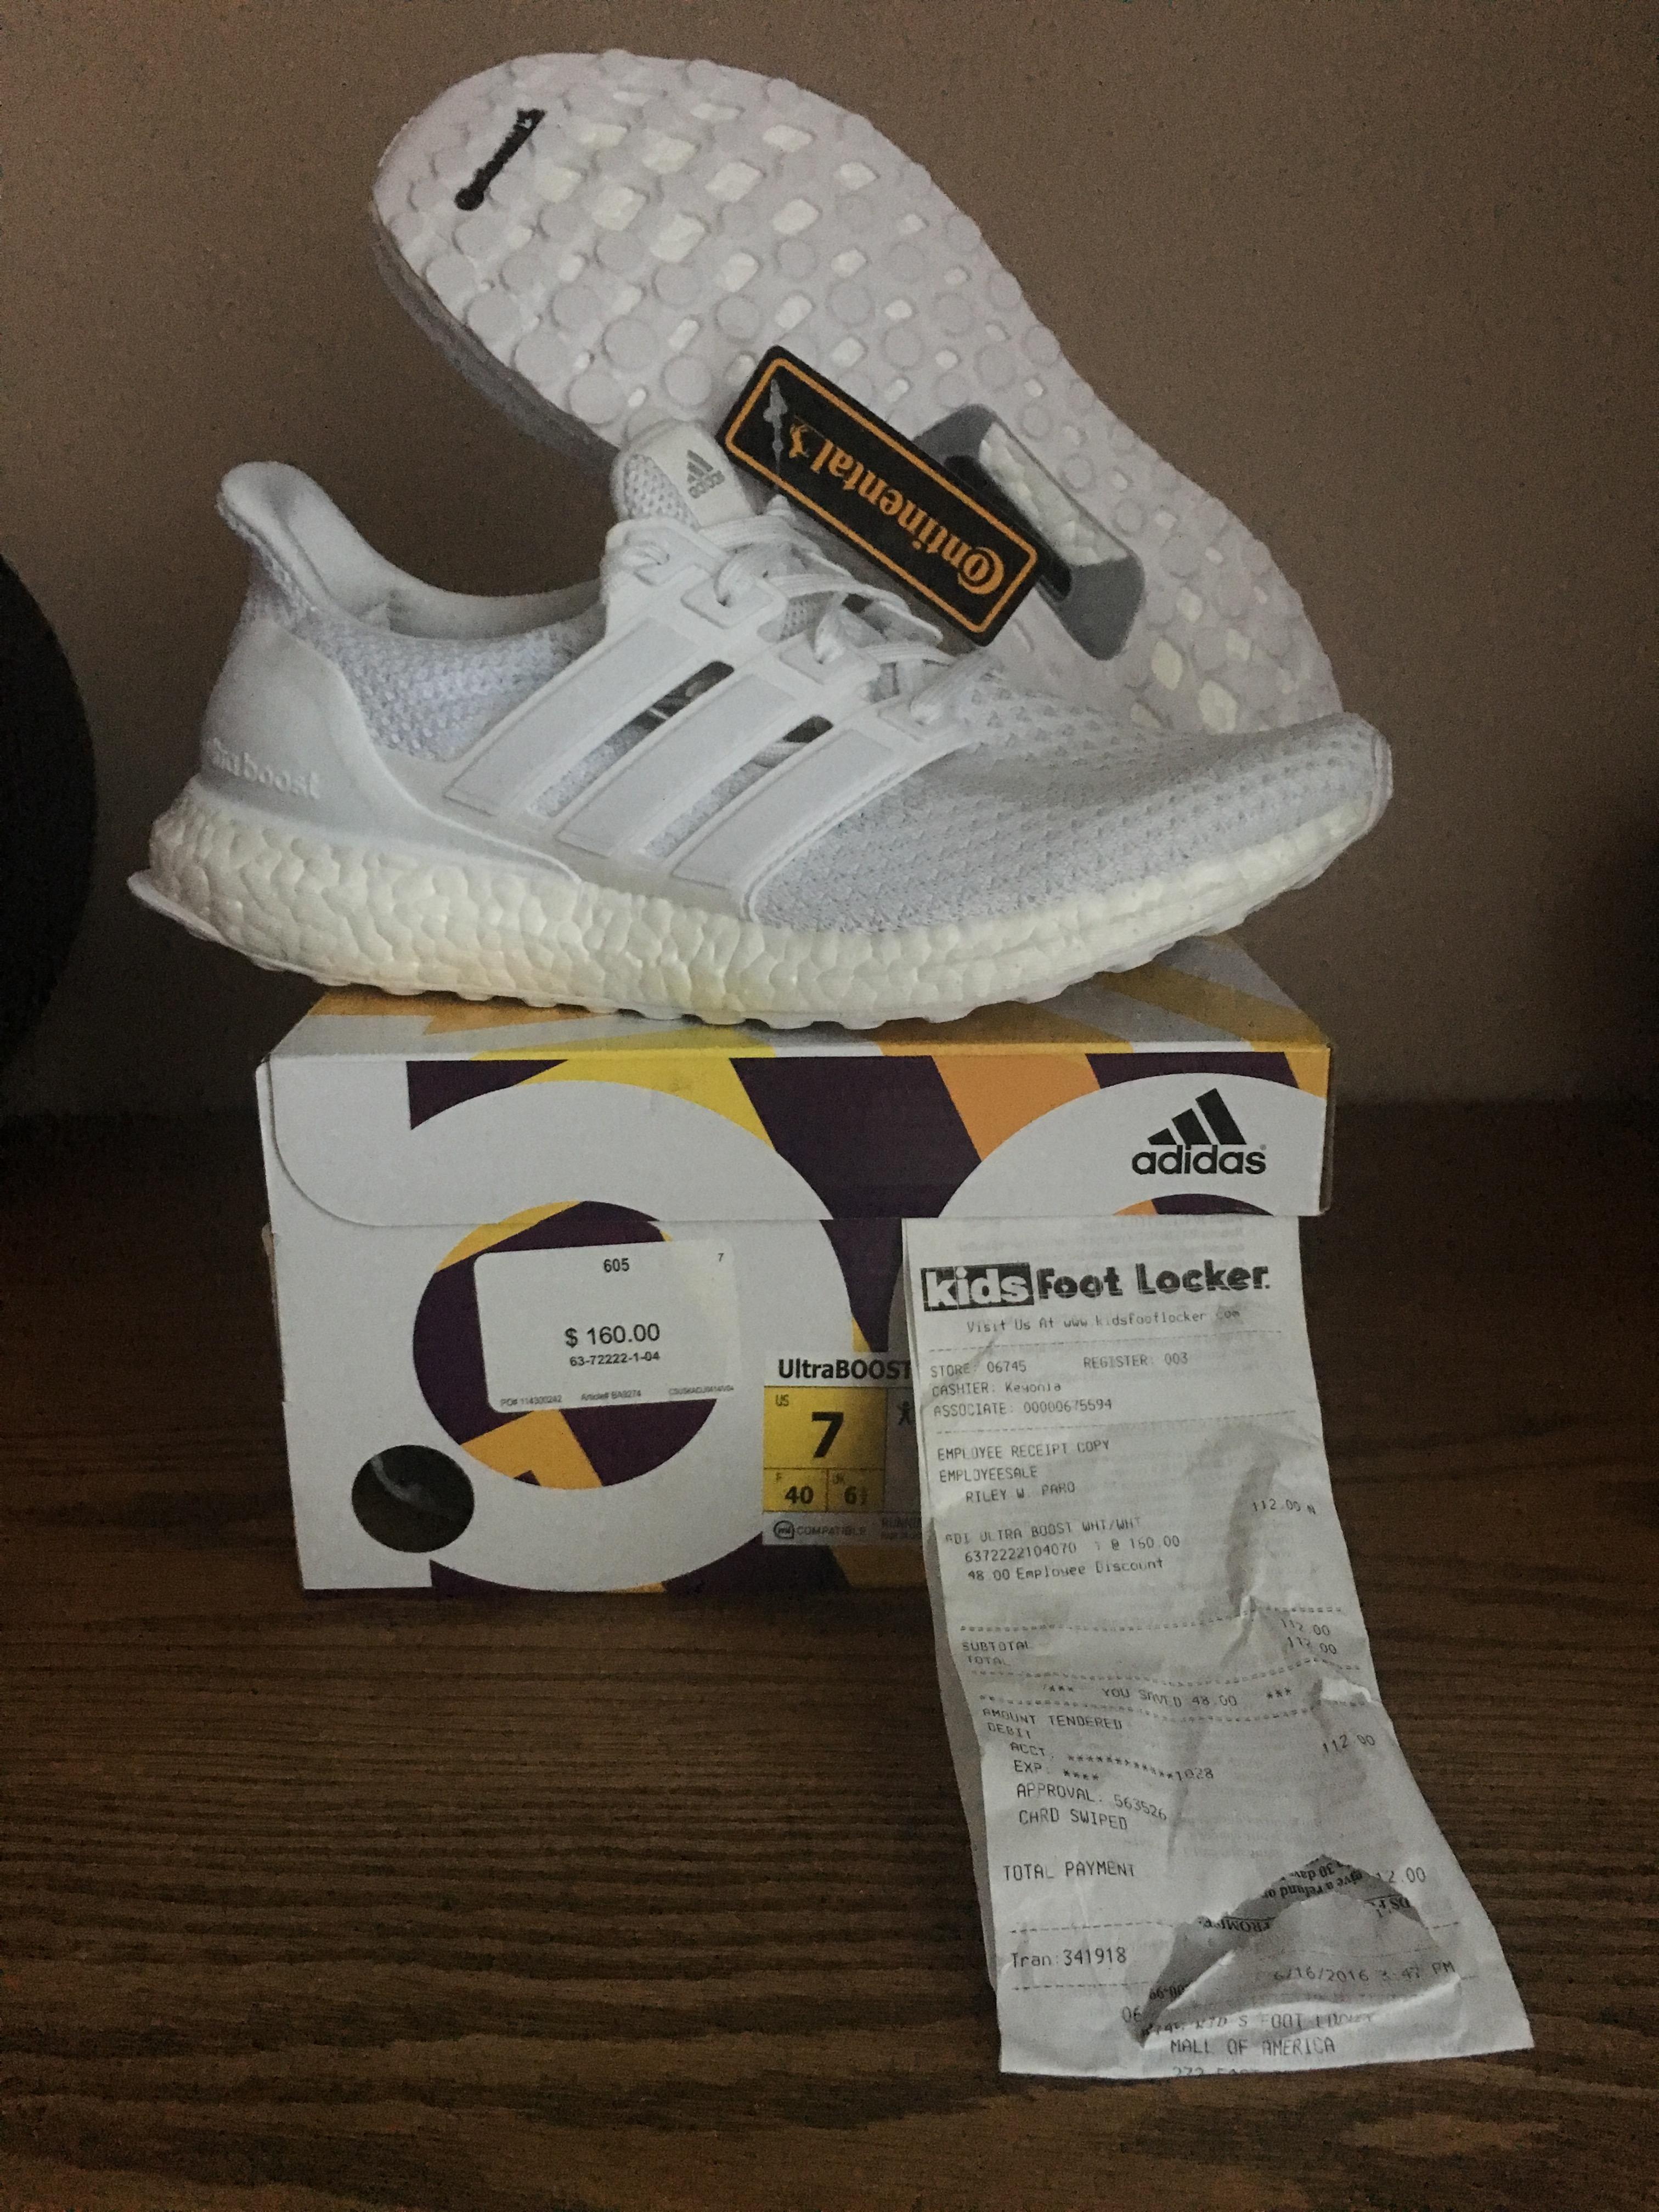 15a2966434554 Adidas Adidas Ultra Boost J S80588 All Triple White Junior GS Kids Women